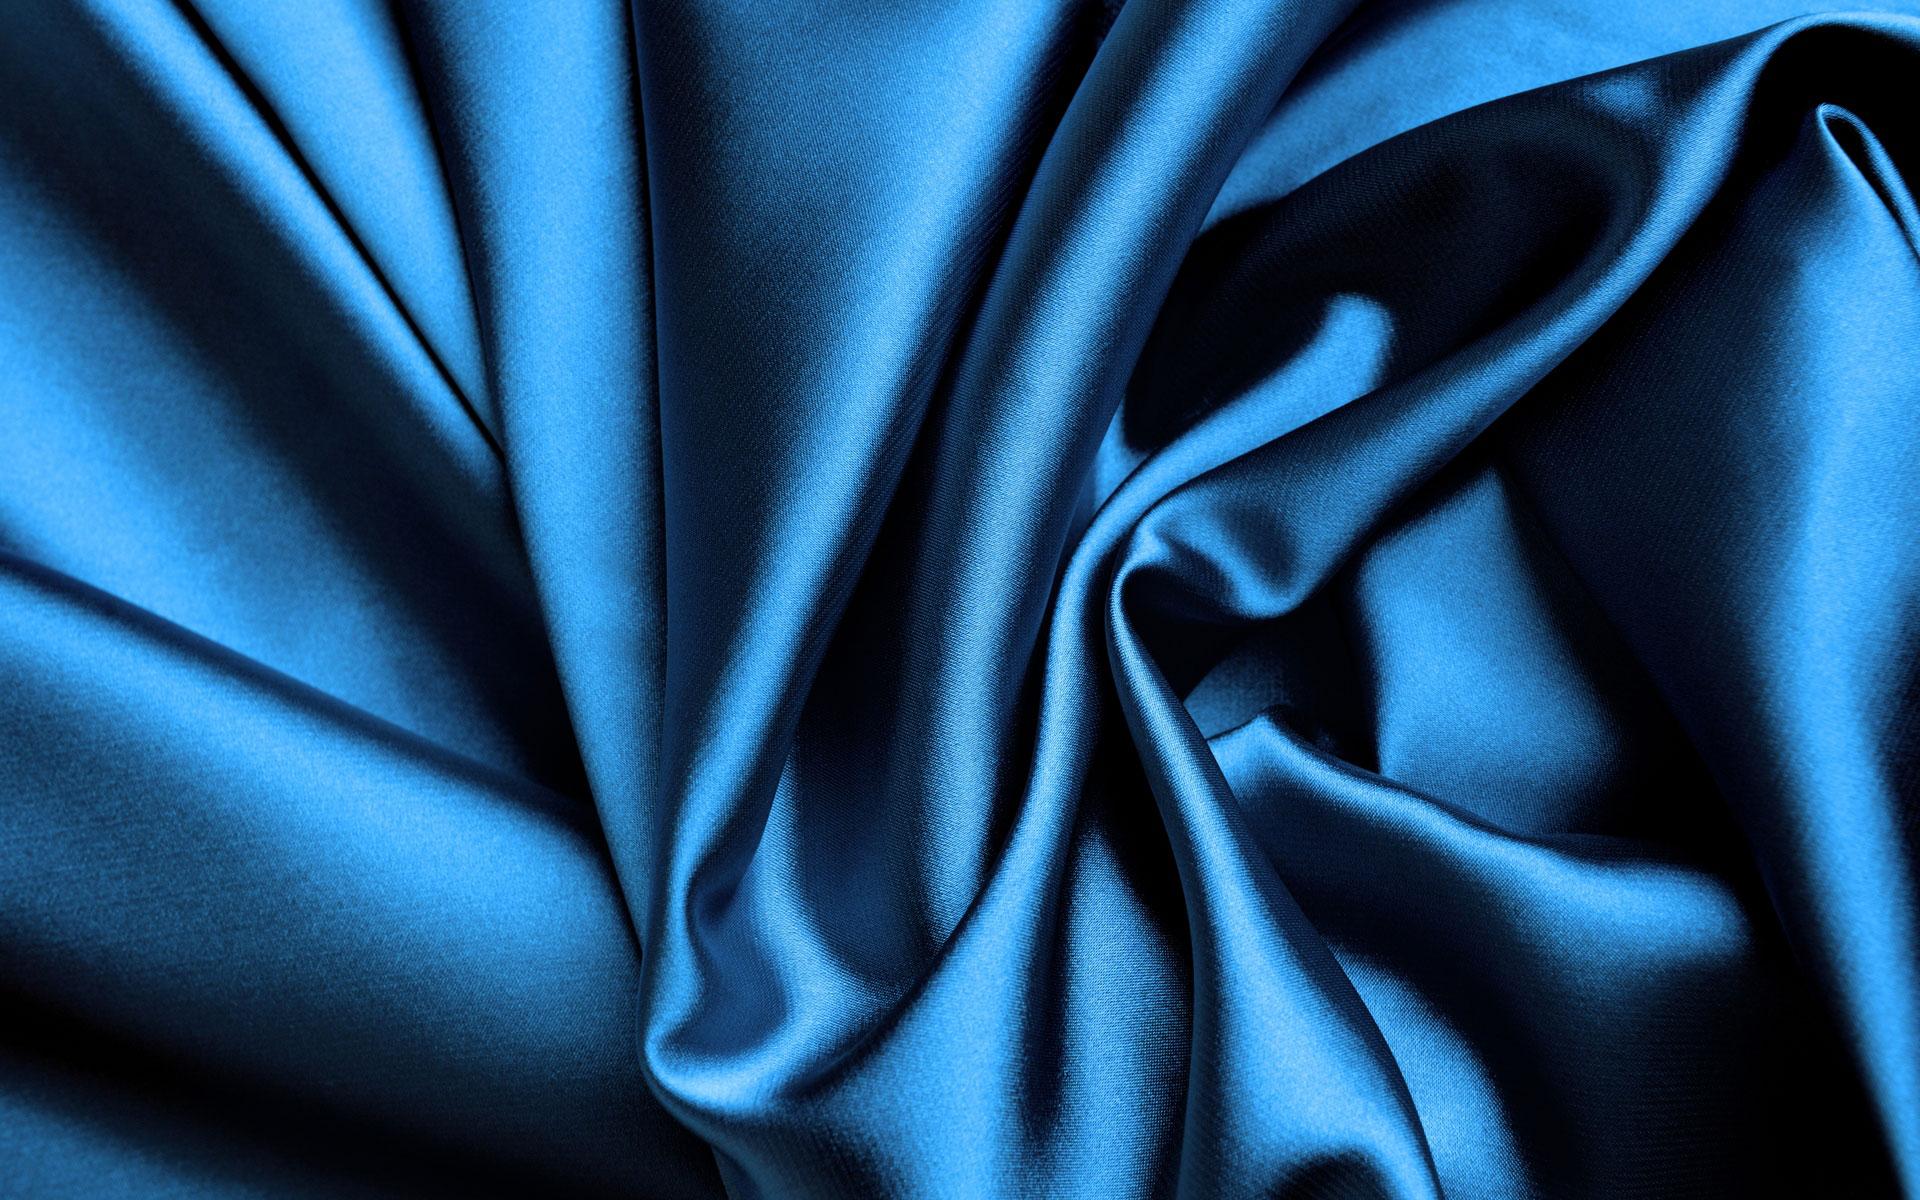 [46+] Silk Wallpaper on WallpaperSafari